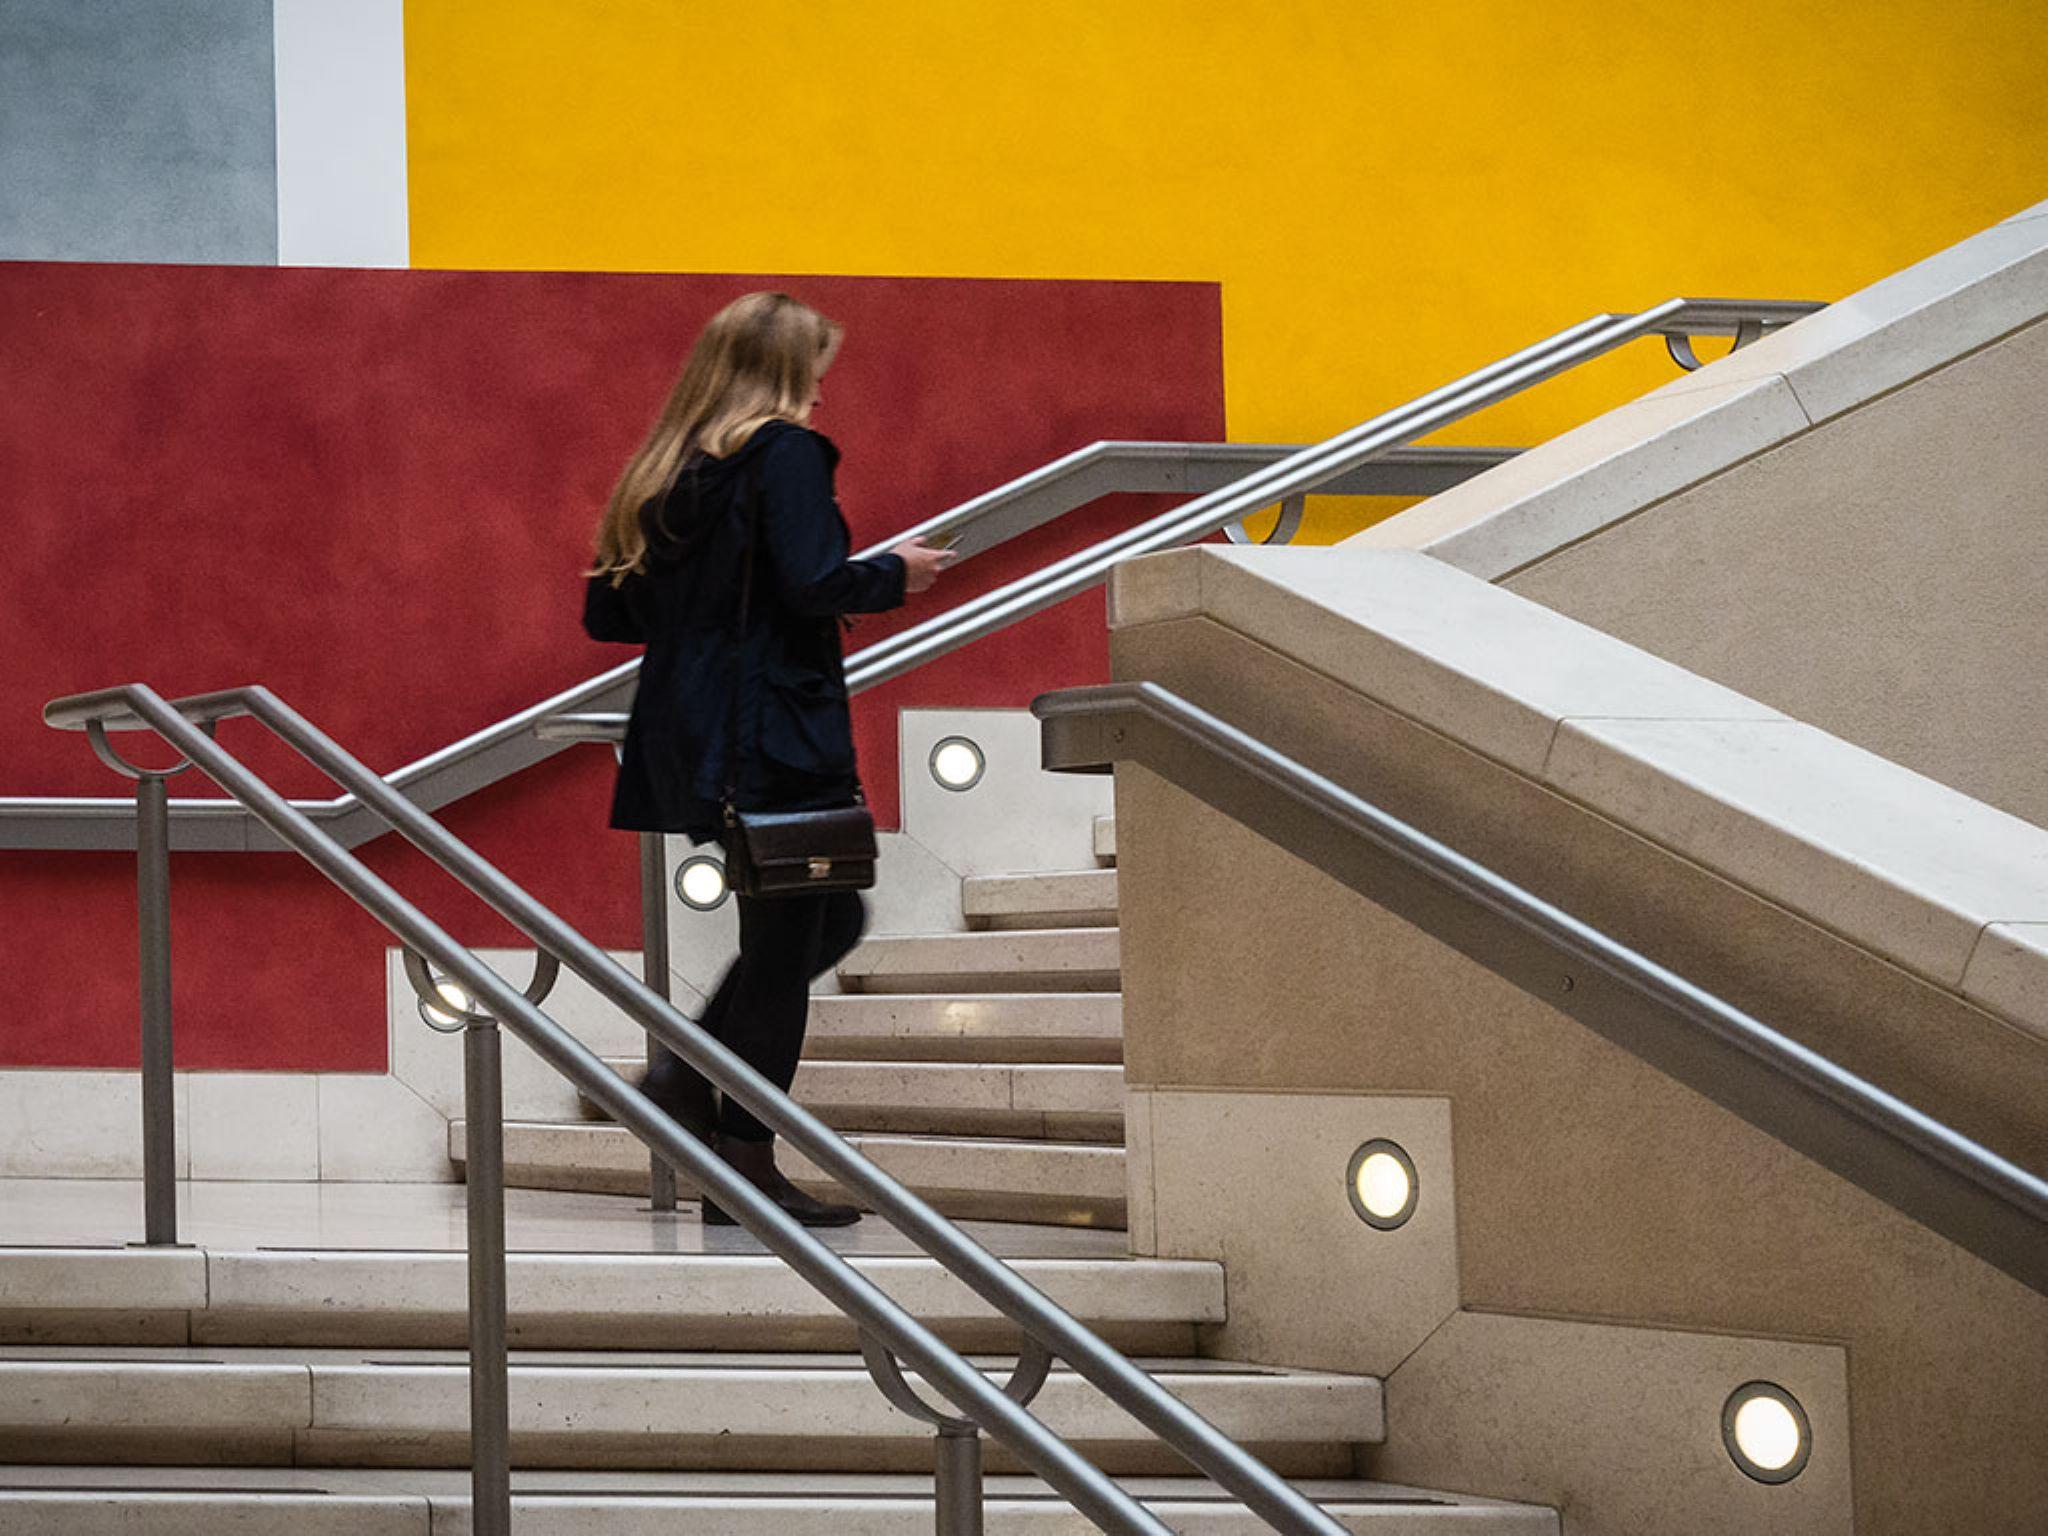 Ascent by DavidNorfolk